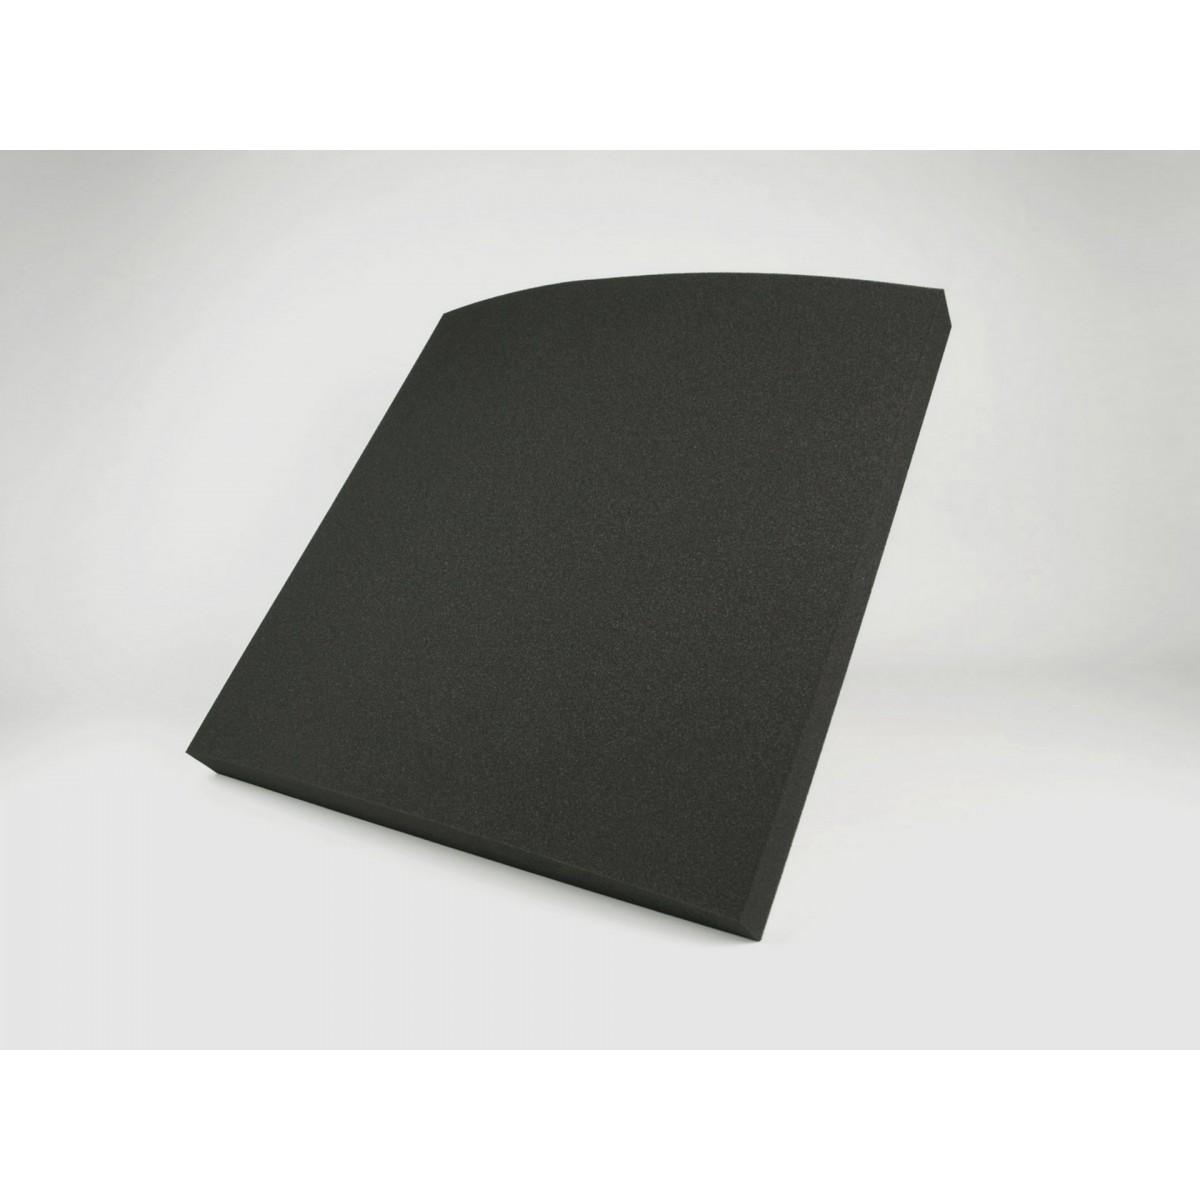 Eliacoustic curve pure dark grey